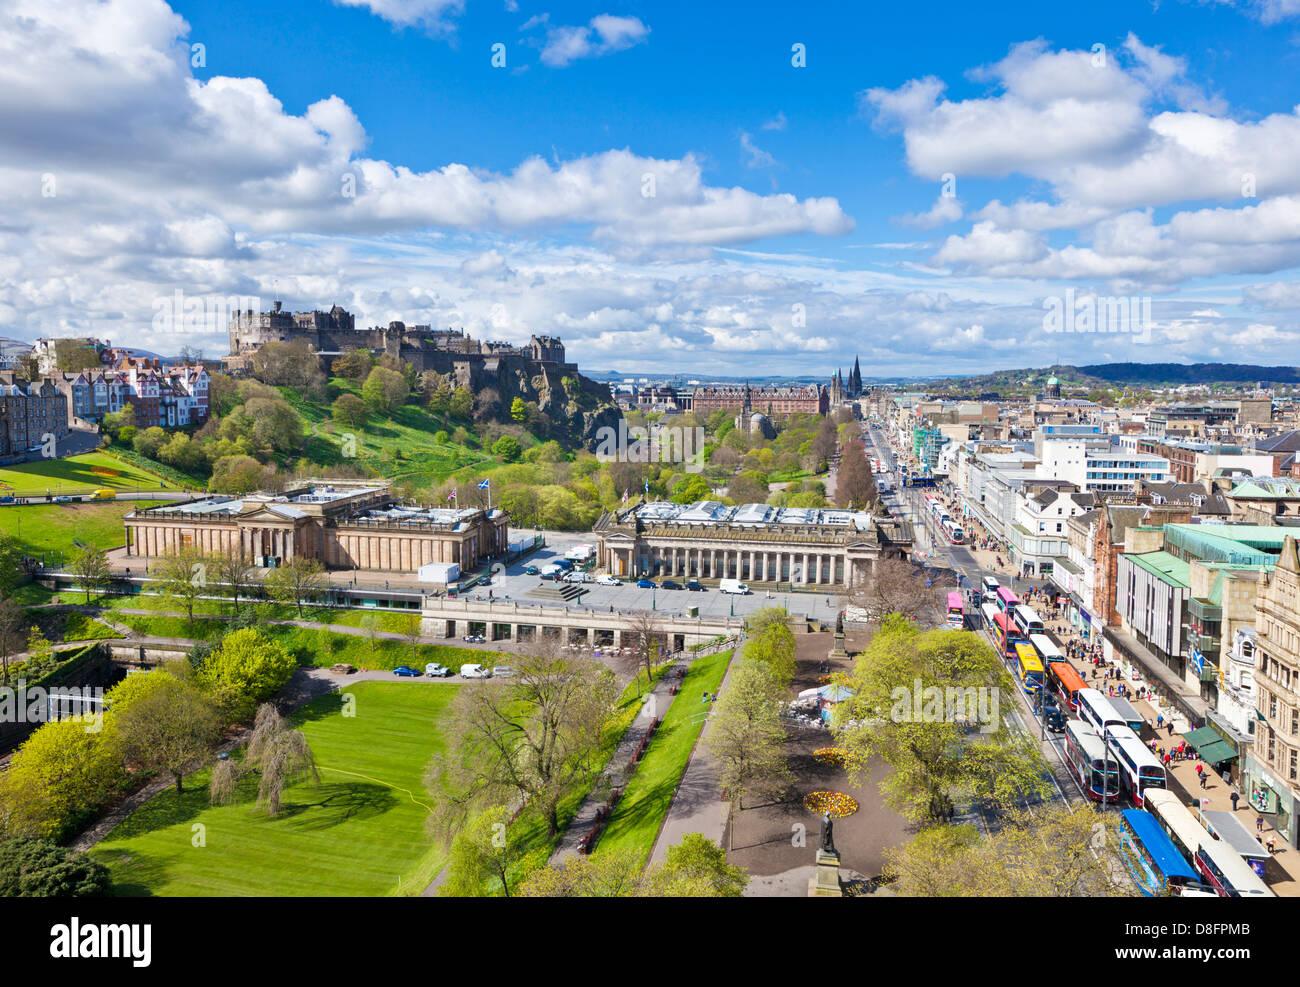 Edinburgh city skyline with the casle and Princes street Edinburgh city centre Edinburgh Midlothian Scotland UK - Stock Image